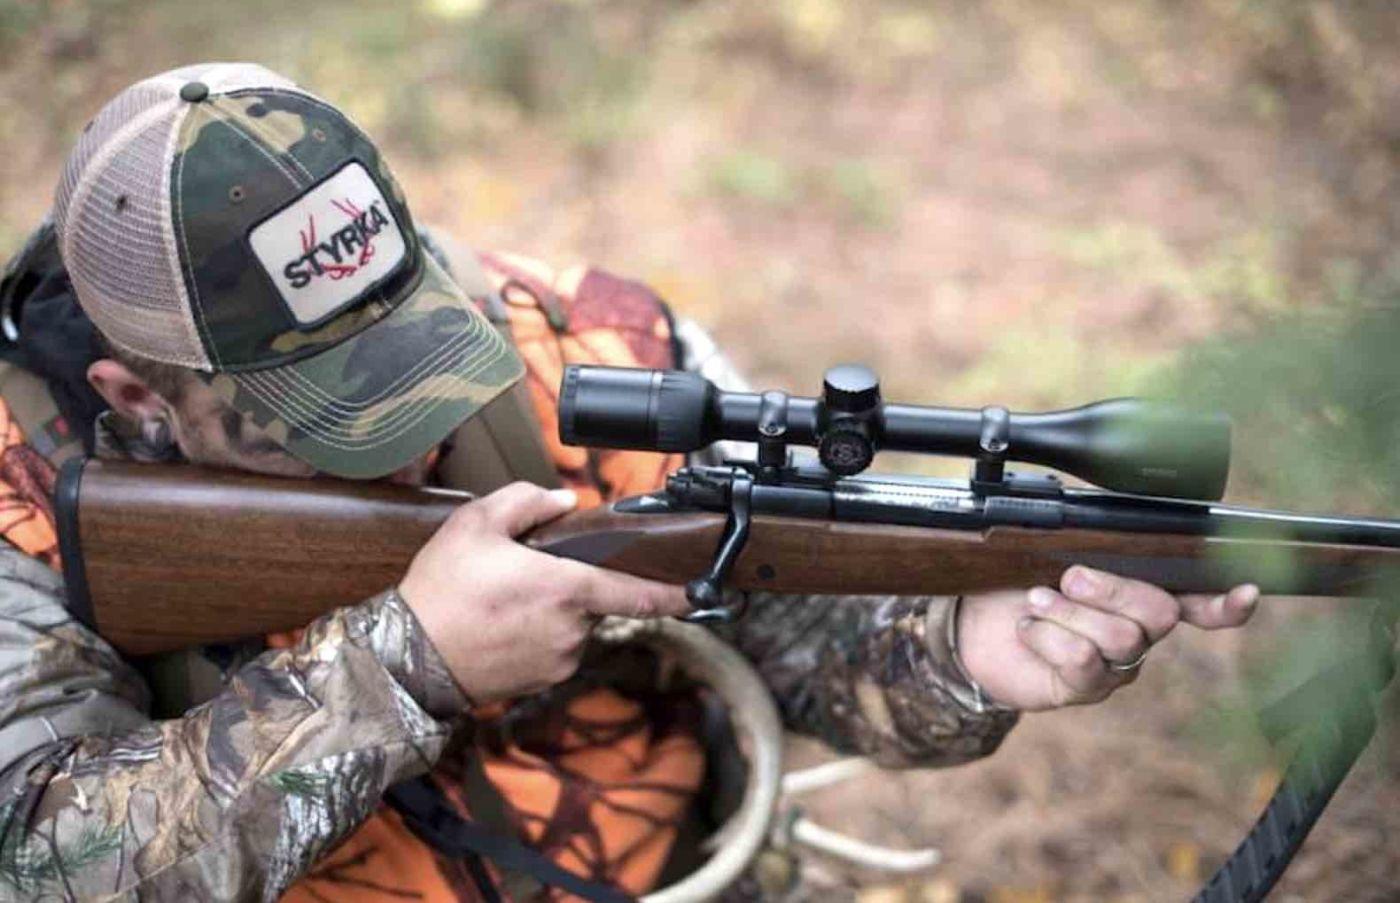 eeda272c09 Shooting Sports Industry News  Zanders expands lines